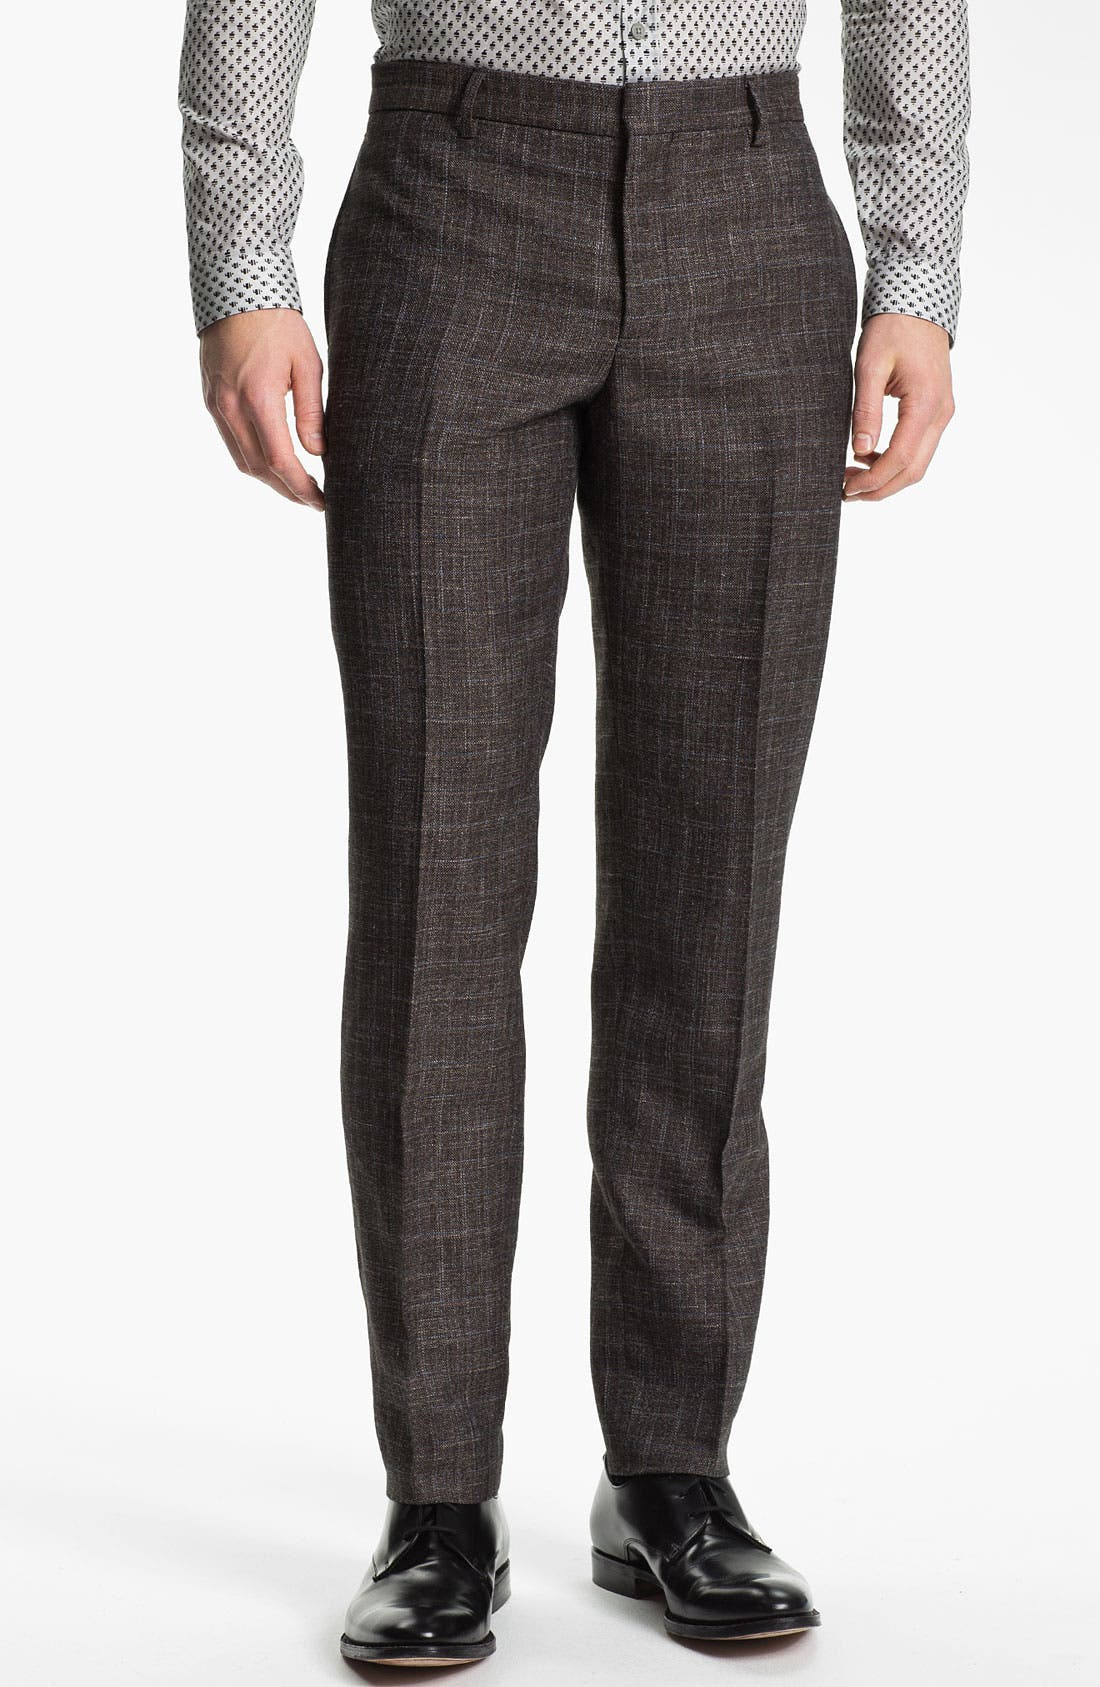 Main Image - Burberry Prorsum Slim Fit Plaid Twill Trousers